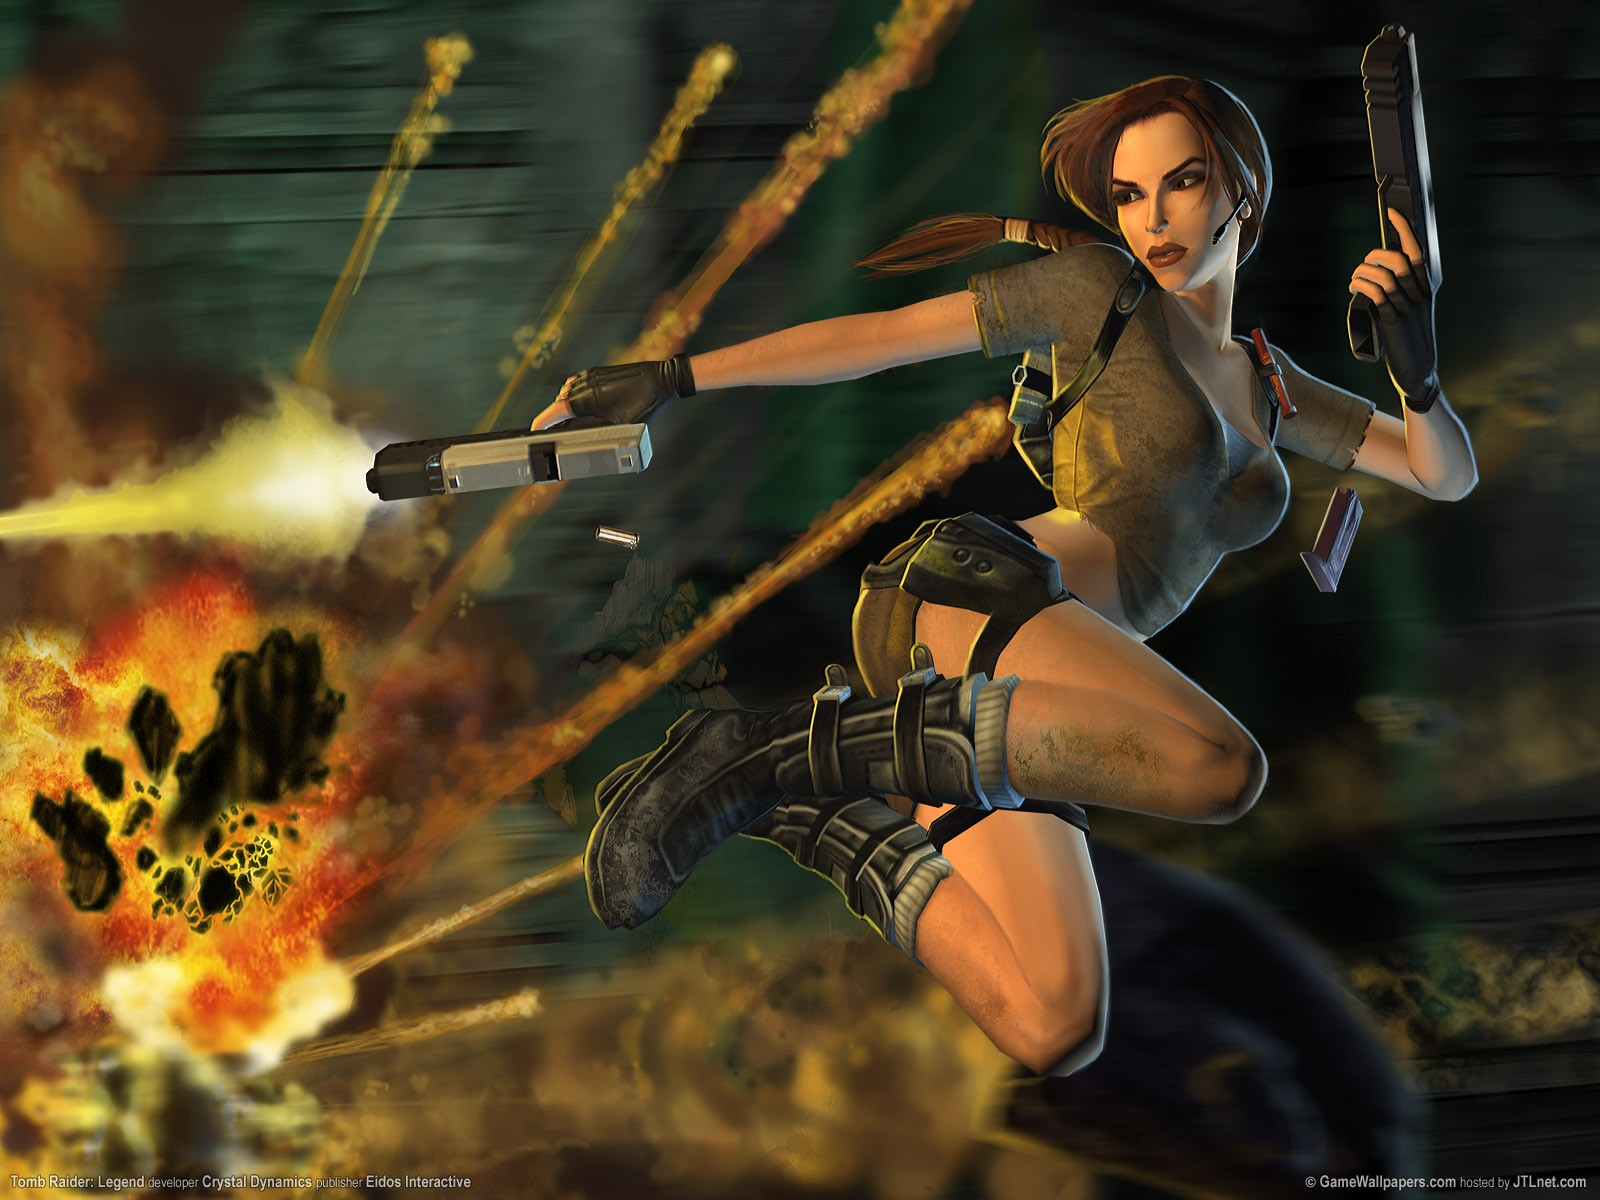 Tomb Raider Legend Details Launchbox Games Database